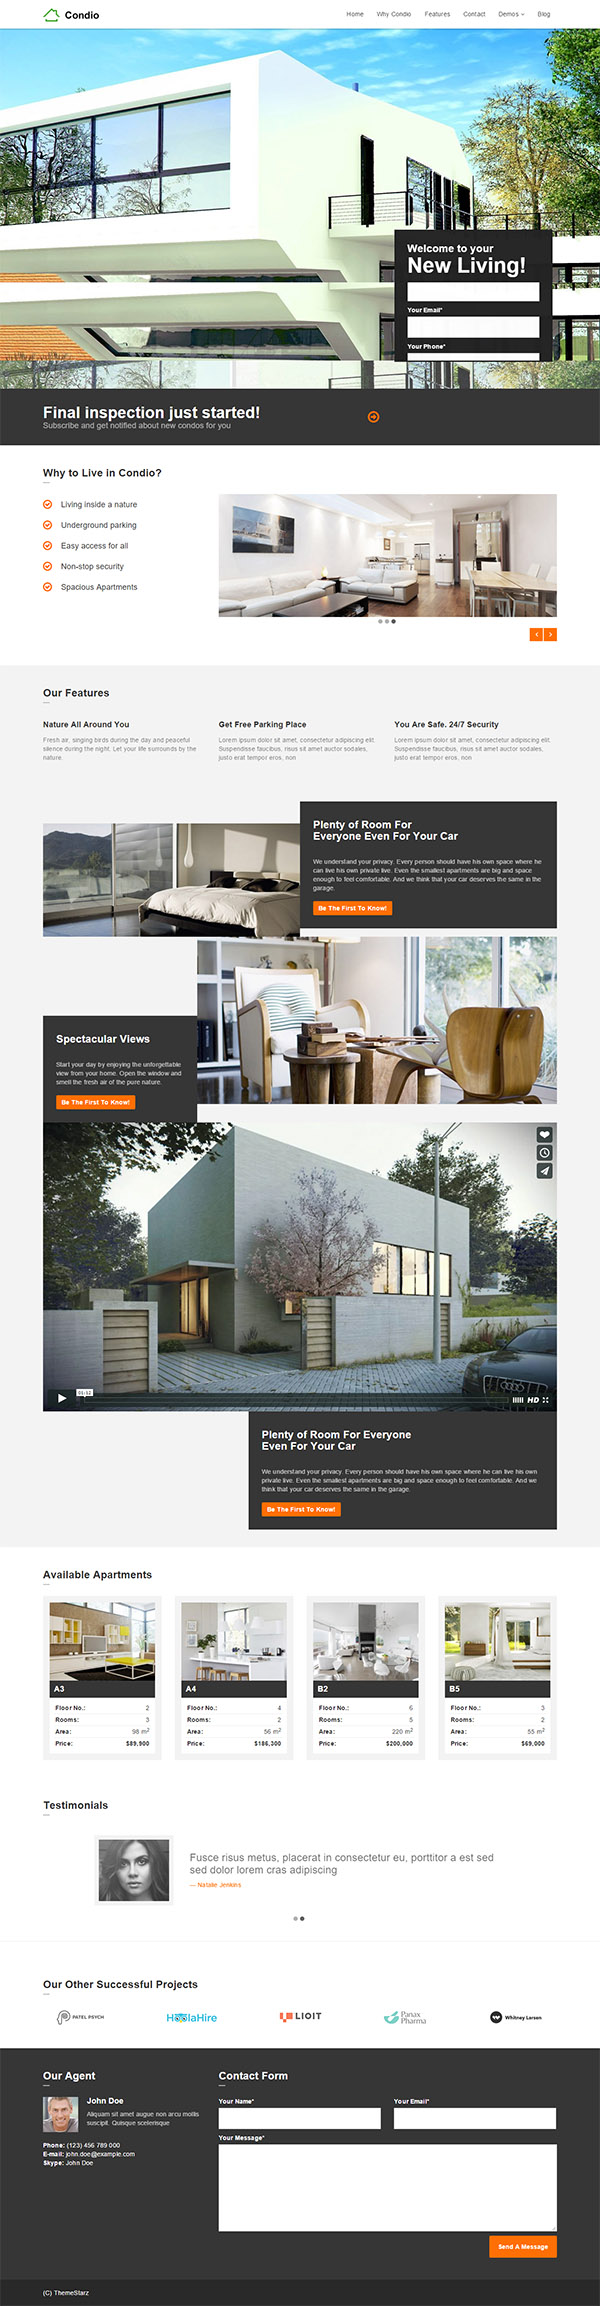 41_WP_Real Estate 06